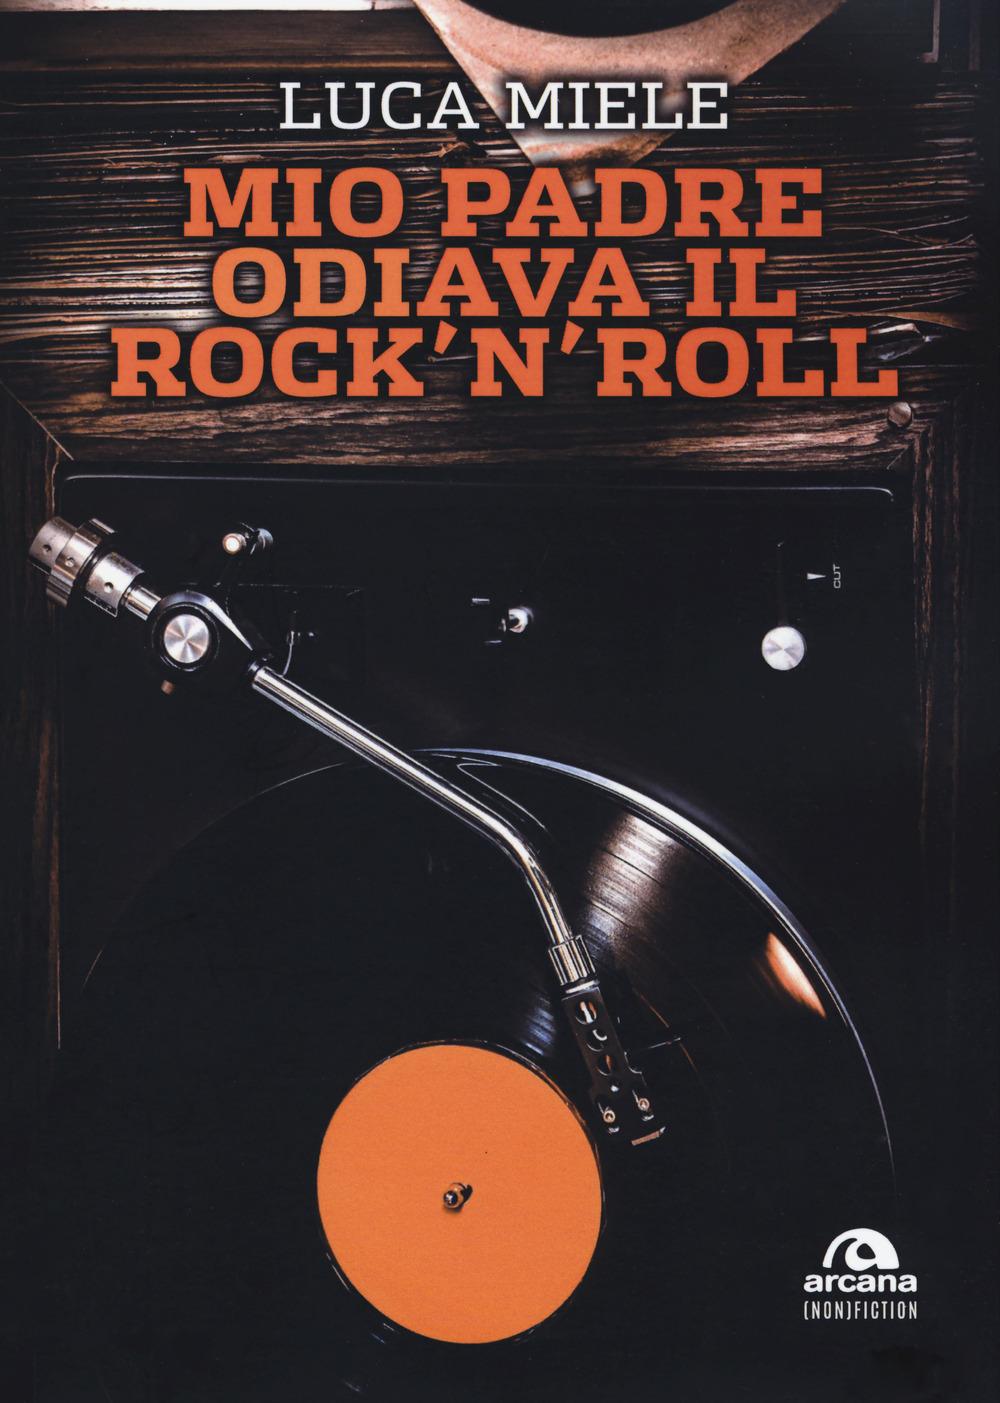 Mio padre odiava il rock'n'roll - 9788862317290